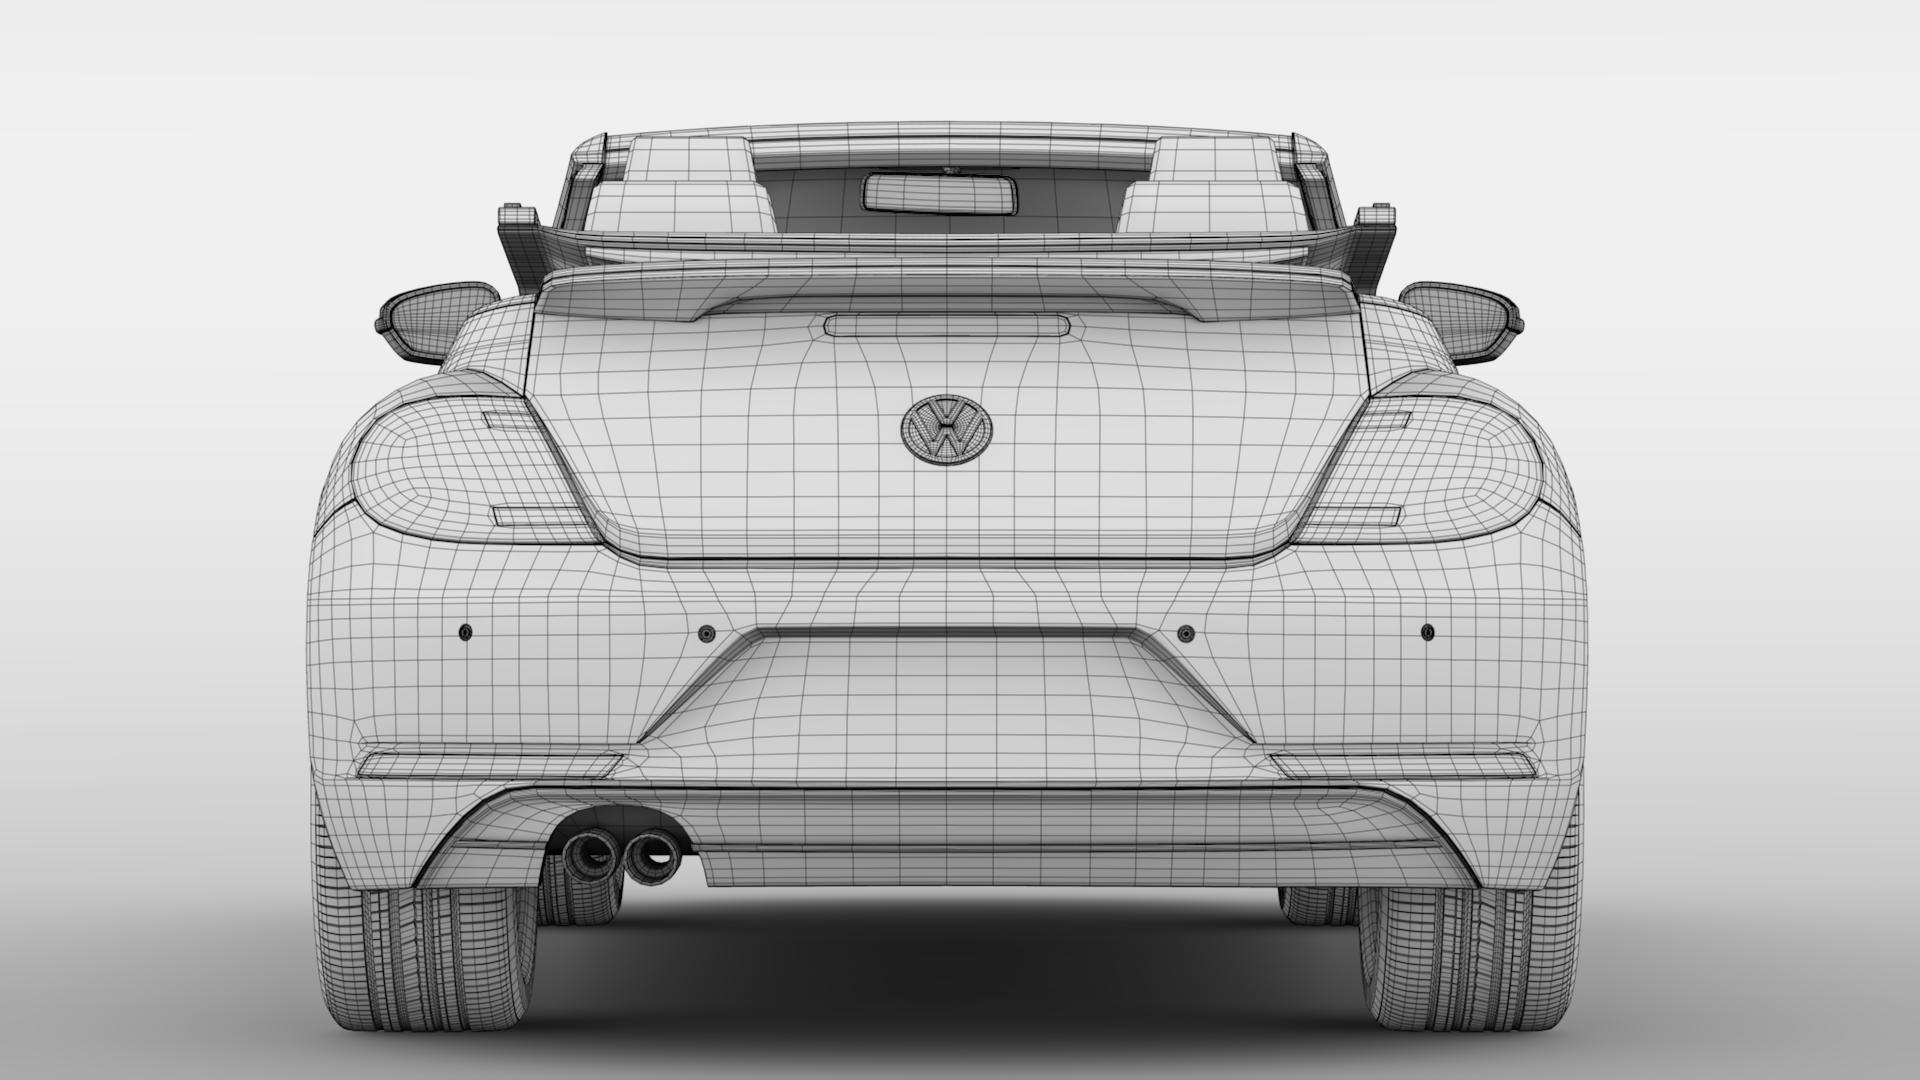 vw beetle cabriolet 2017 3d model 3ds max fbx c4d lwo ma mb hrc xsi obj 221609